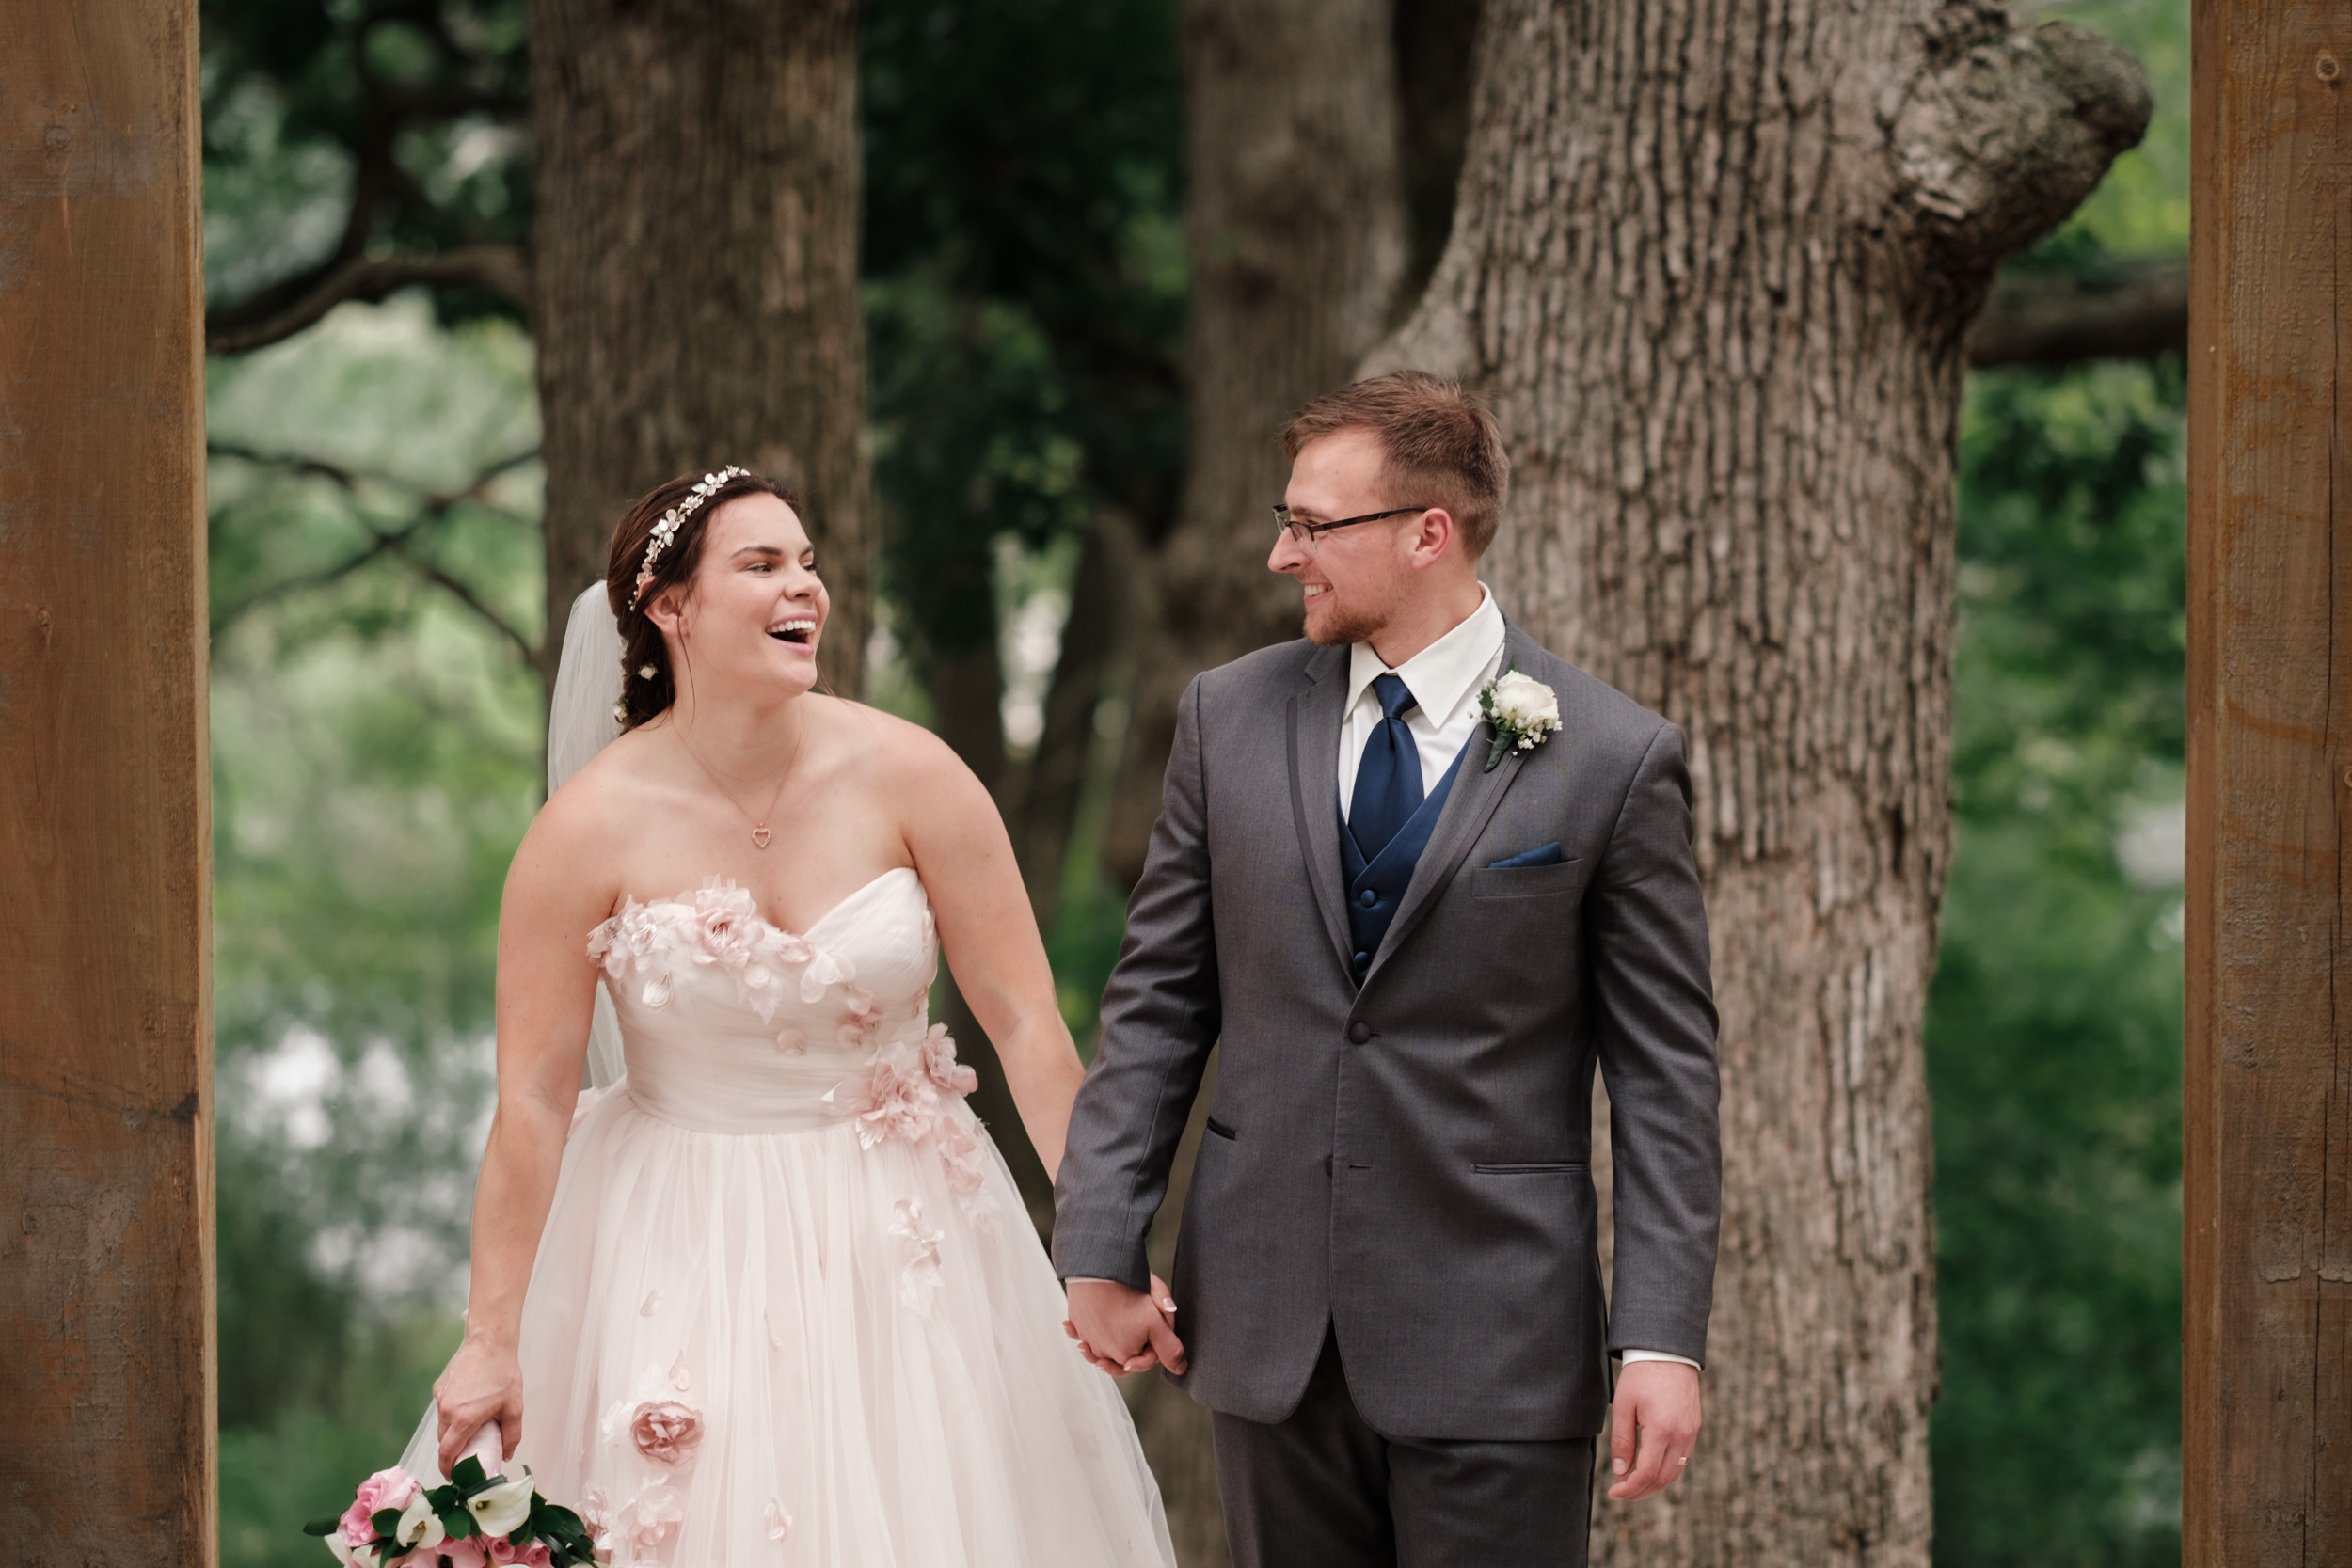 19-06-22-Ryan-Katie-The-Fields-Reserve-Wedding-38.jpg